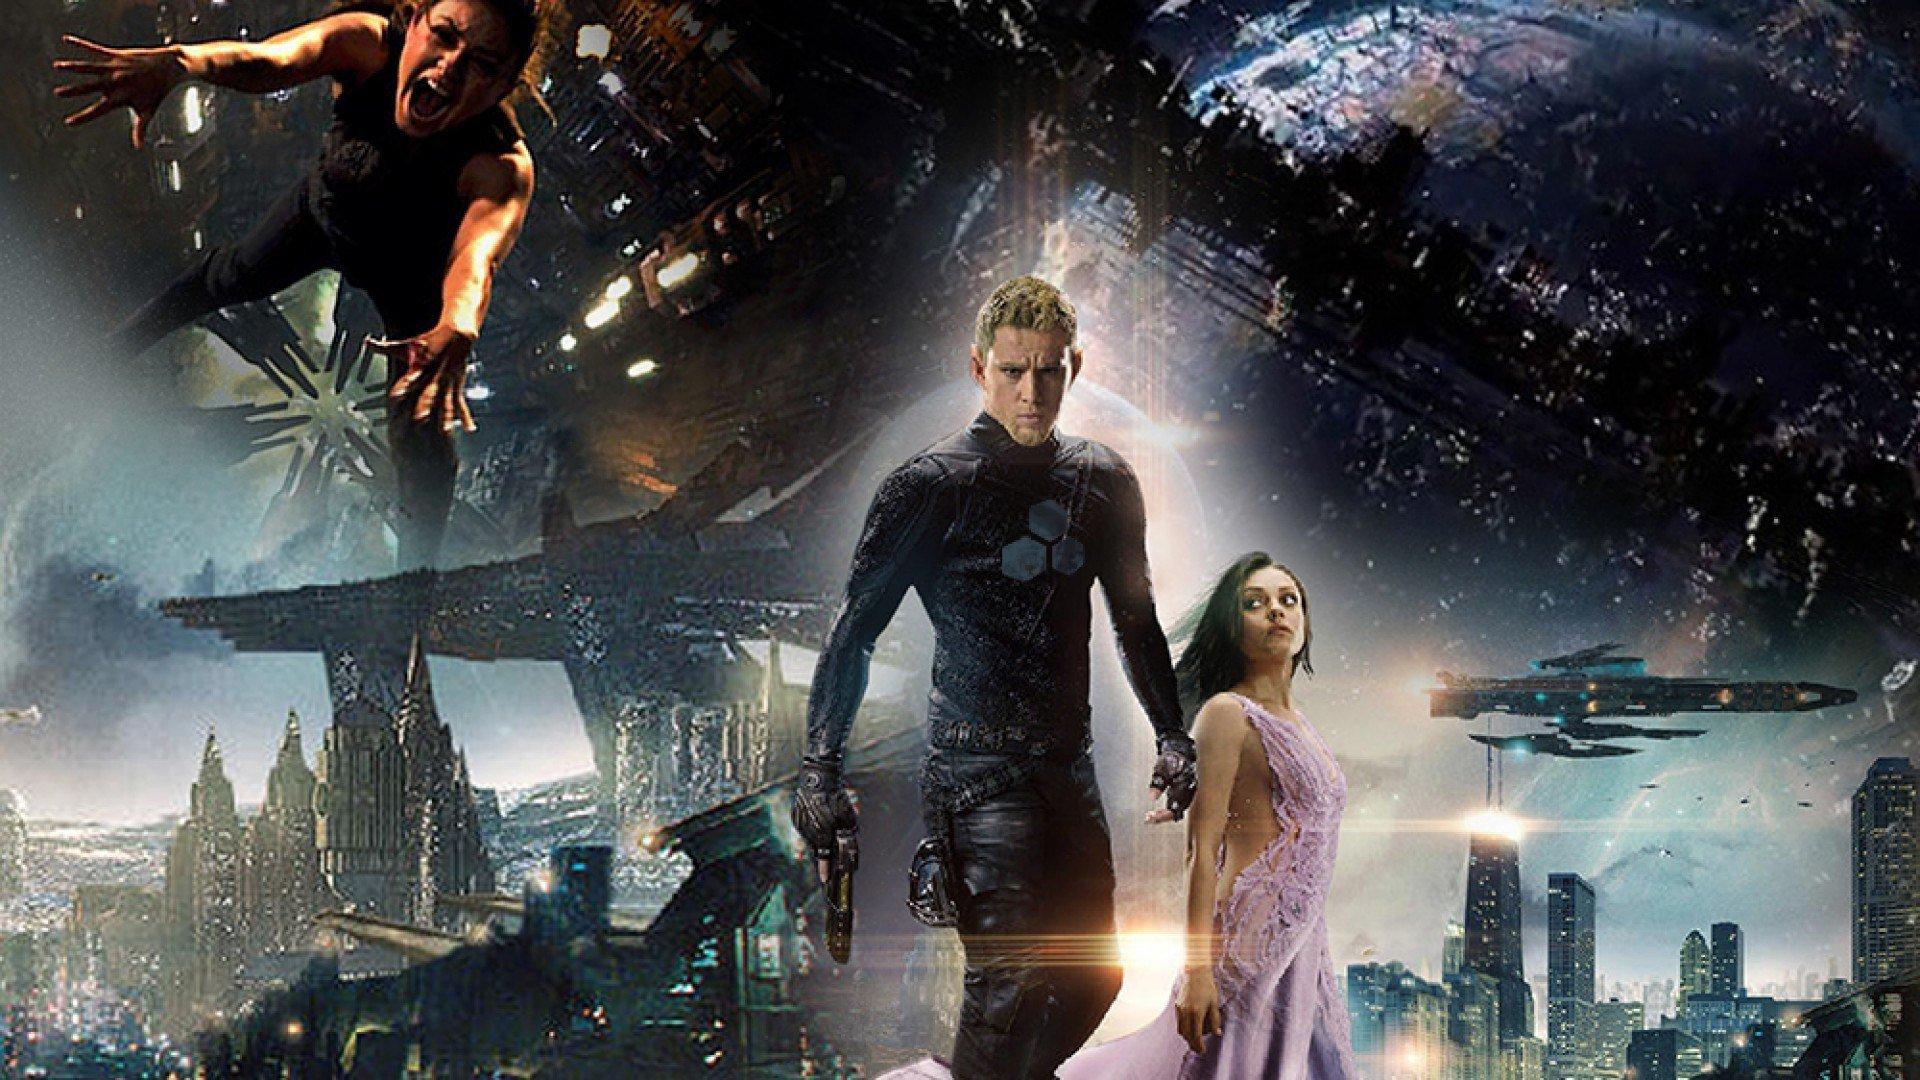 Jupiter Ascending Retina Movie Wallpaper: JUPITER ASCENDING Action Adventure Sci-fi Fantasy